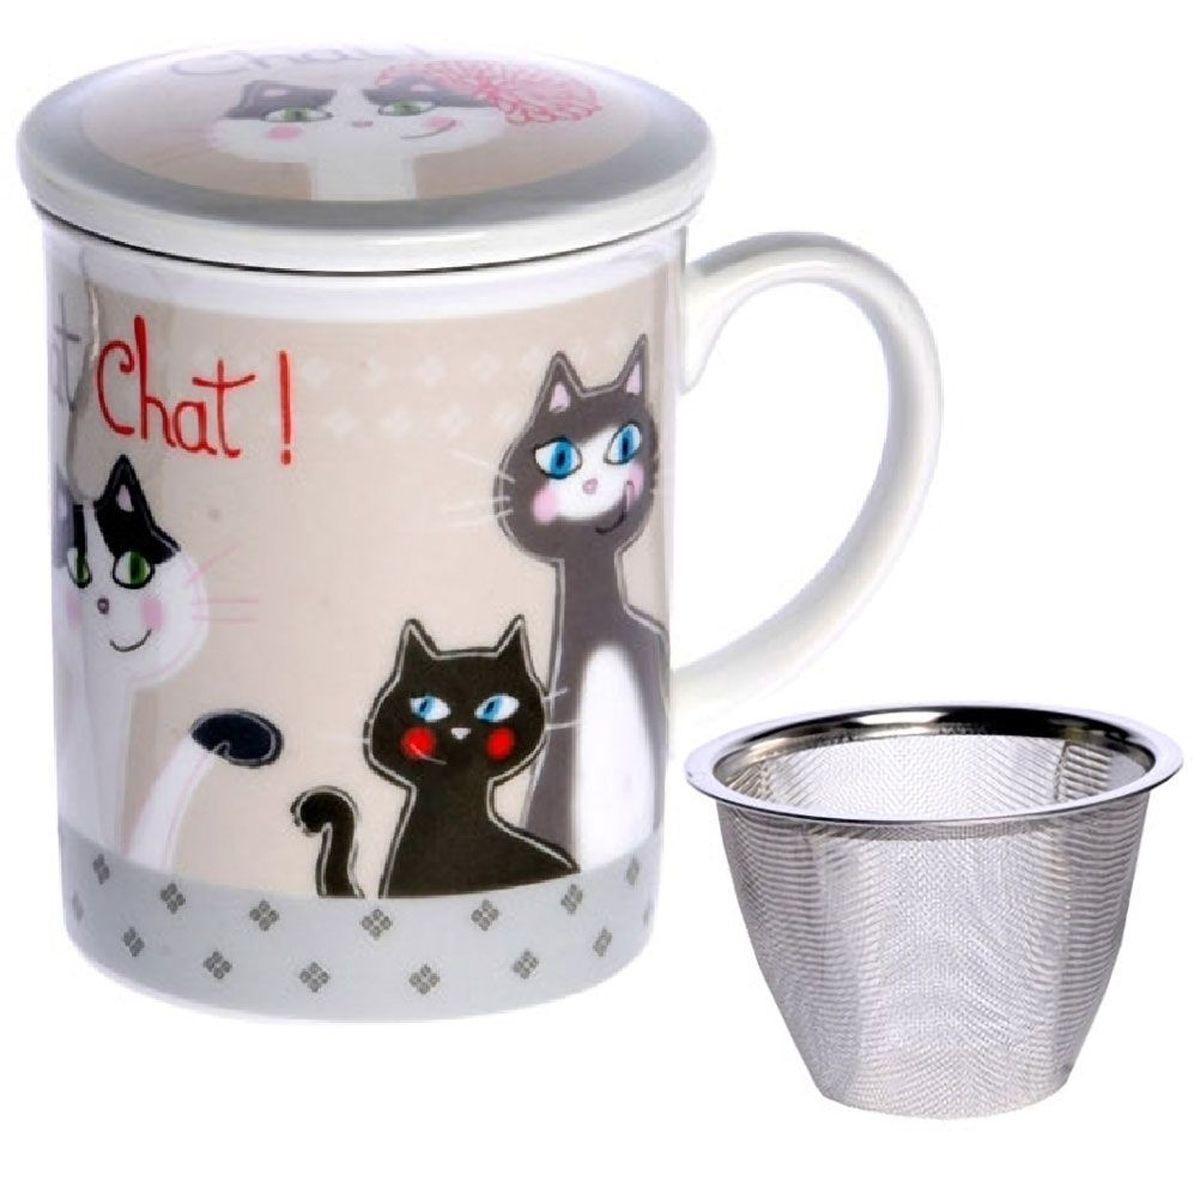 tisani re d co mug vaisselle tasse cadeau cuisine. Black Bedroom Furniture Sets. Home Design Ideas